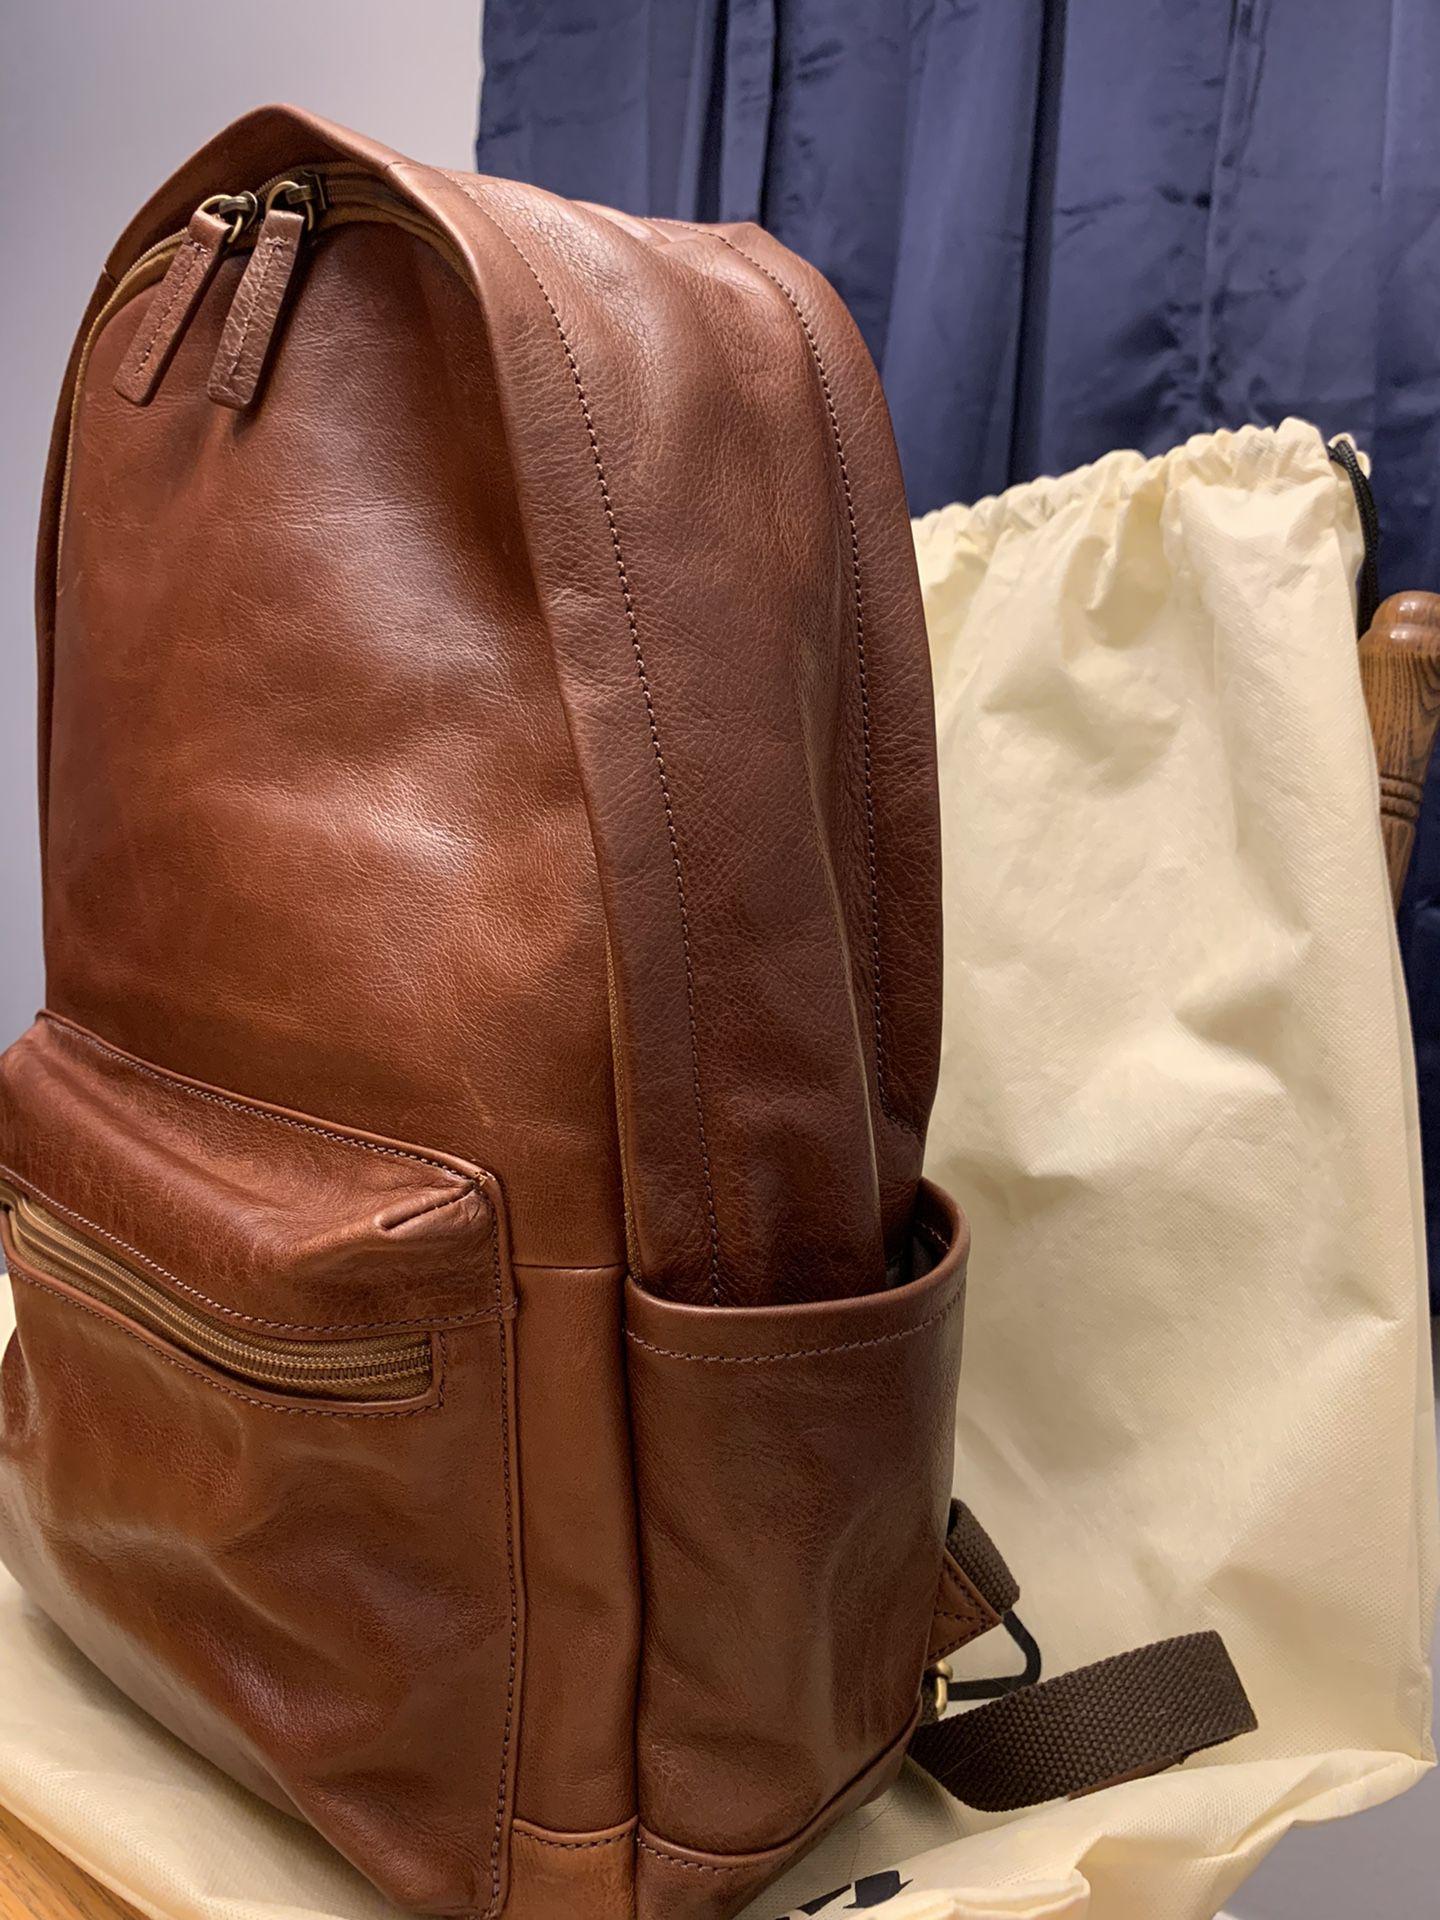 Men's Fossil Backpack